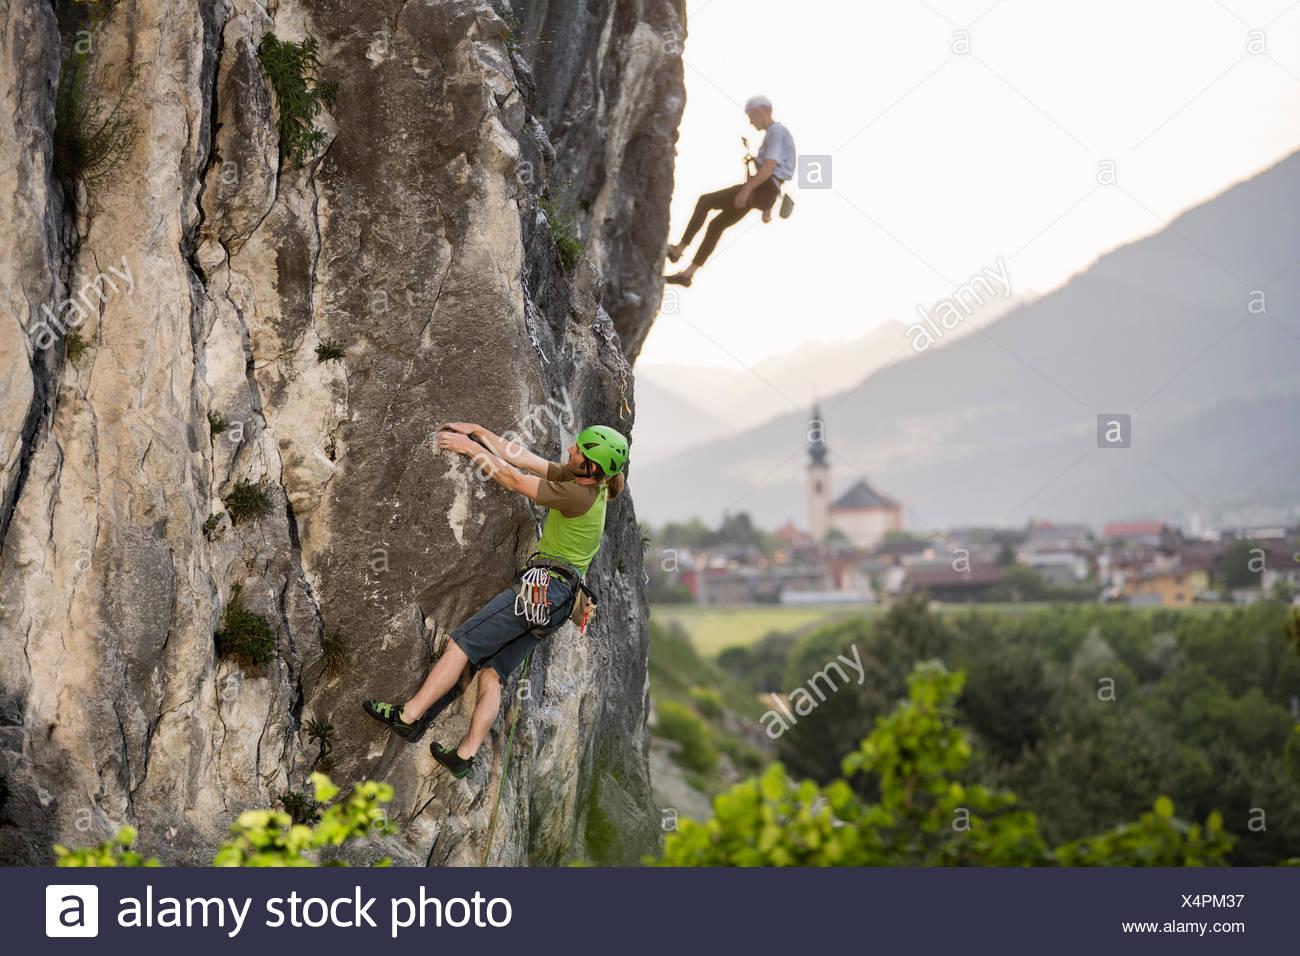 Climber lead climbing on a rock wall, climber abseiling behind, Zirl behind, Martinswand, Tyrol, Austria - Stock Image